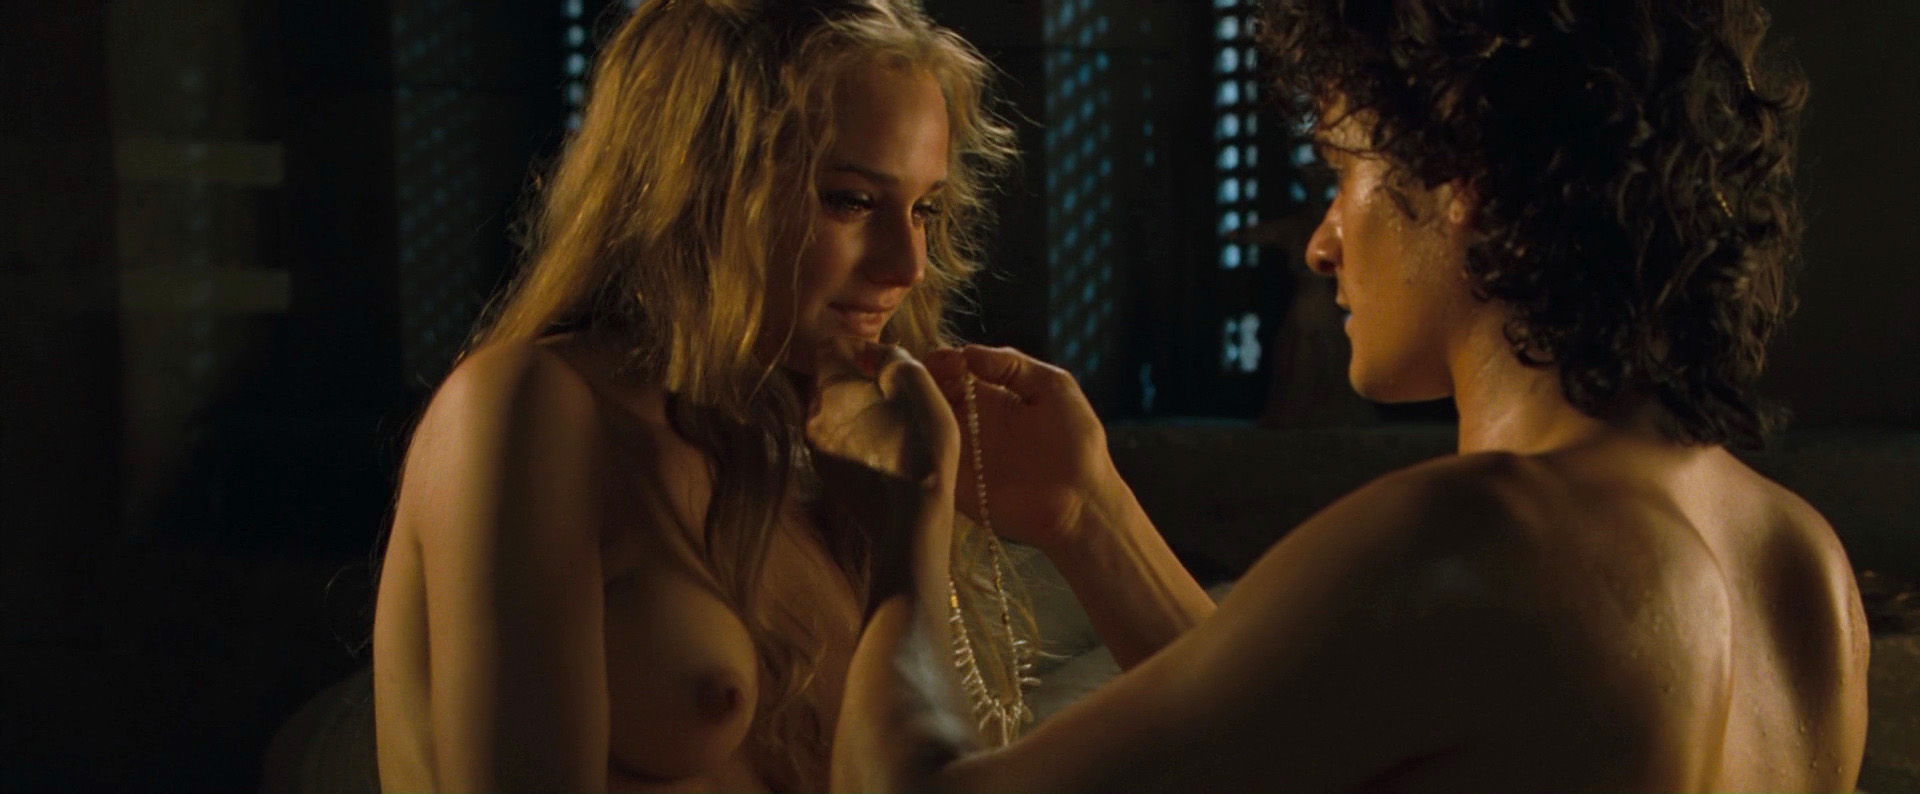 Are diane kruger naked scene that